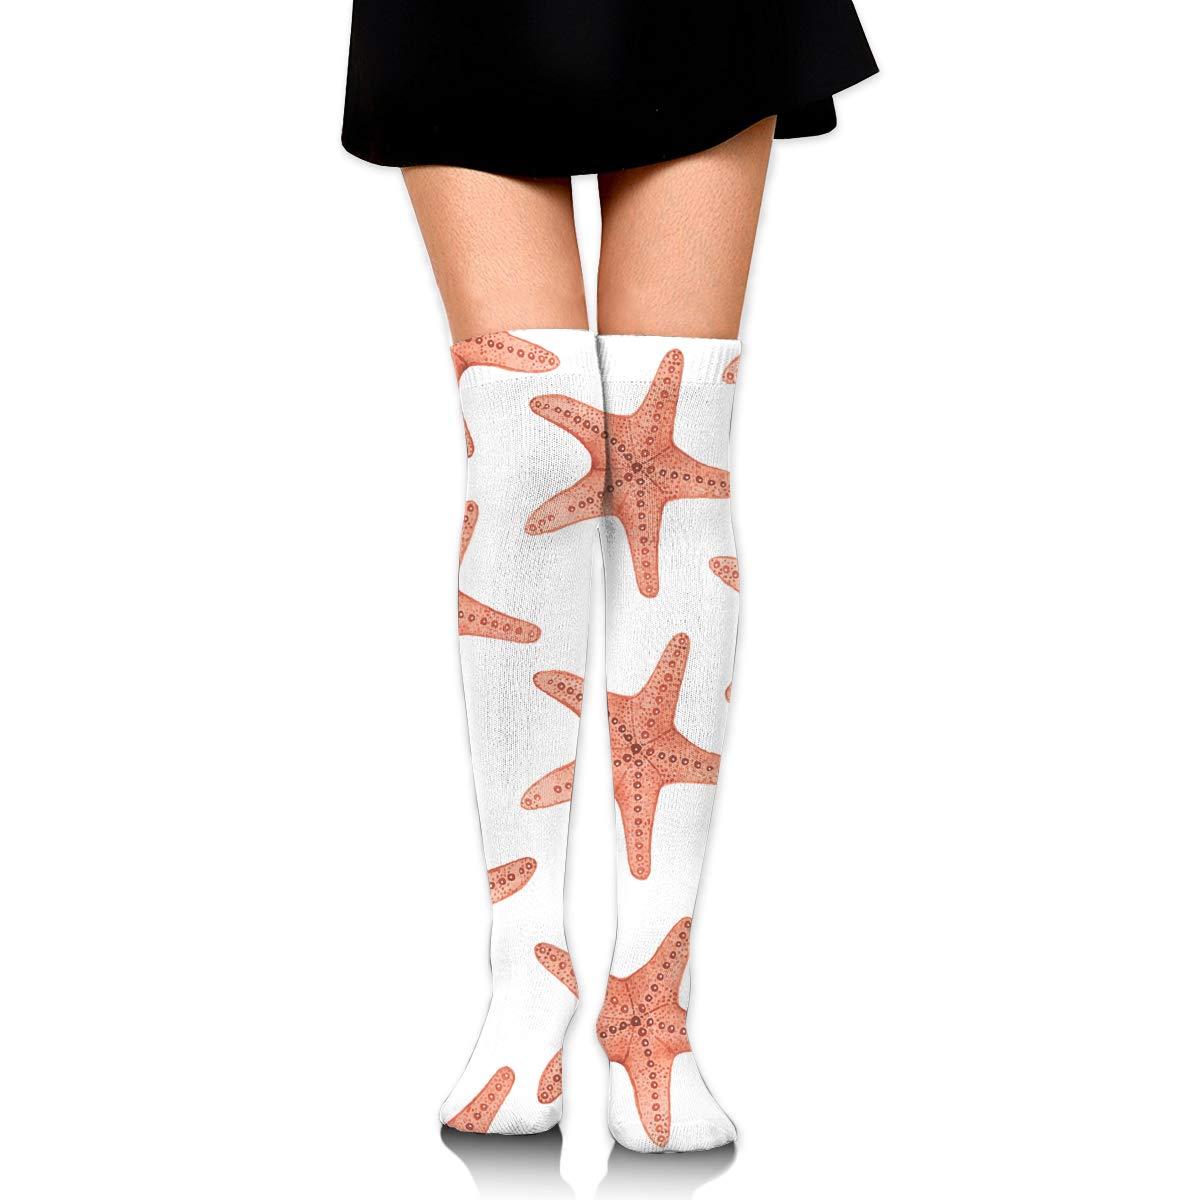 High Elasticity Girl Cotton Knee High Socks Uniform Orange Starfish Women Tube Socks